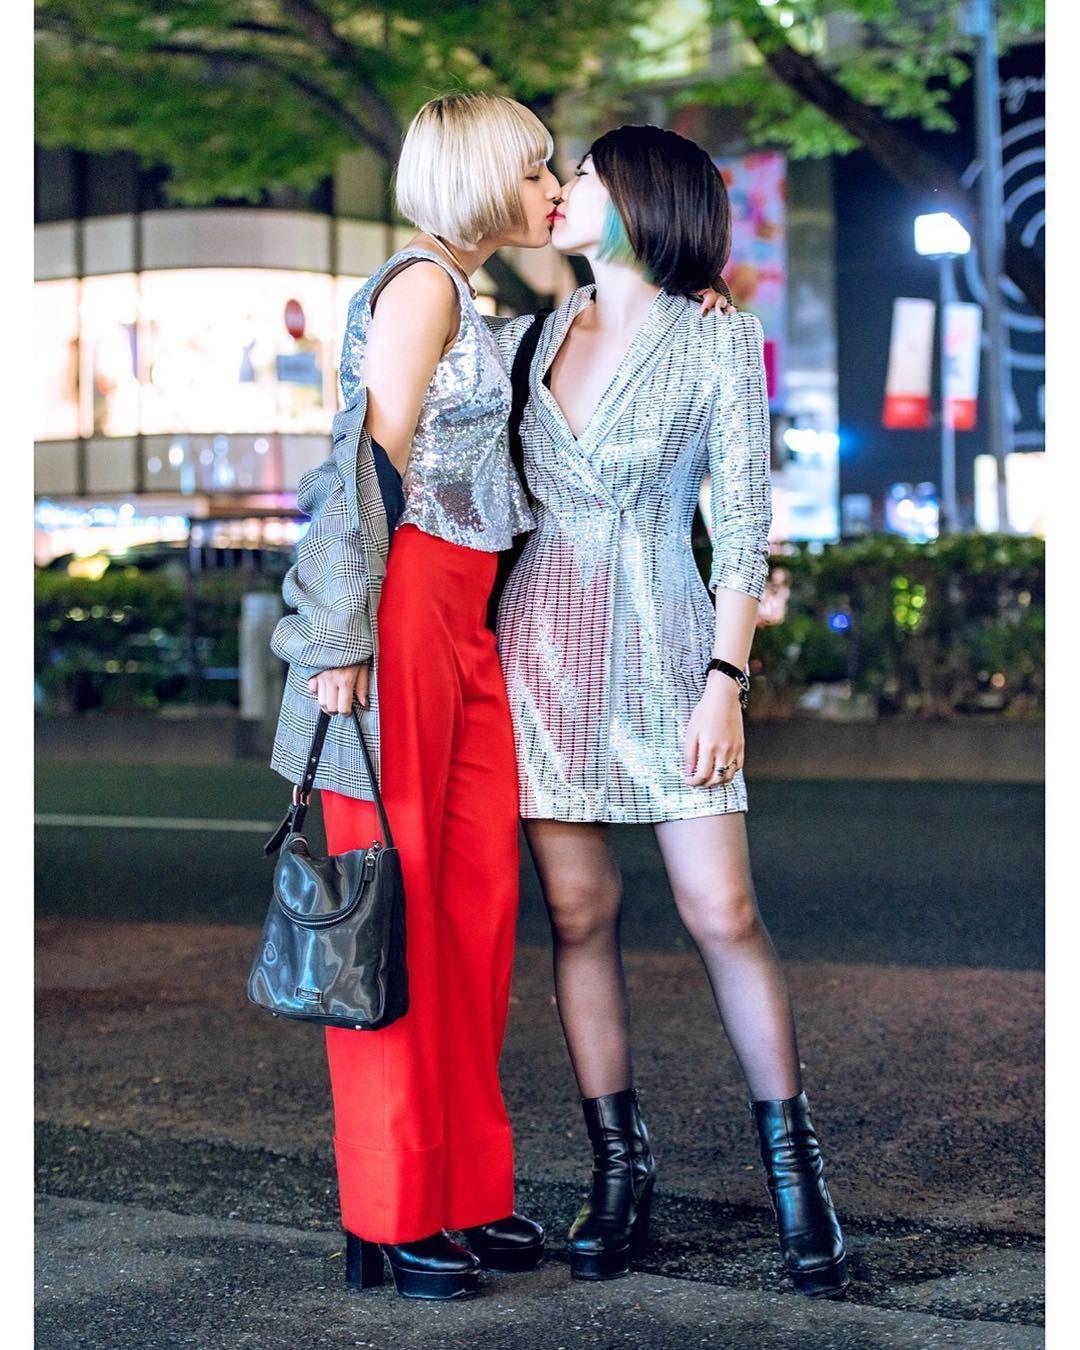 Japanese lesbians in thigh high socks